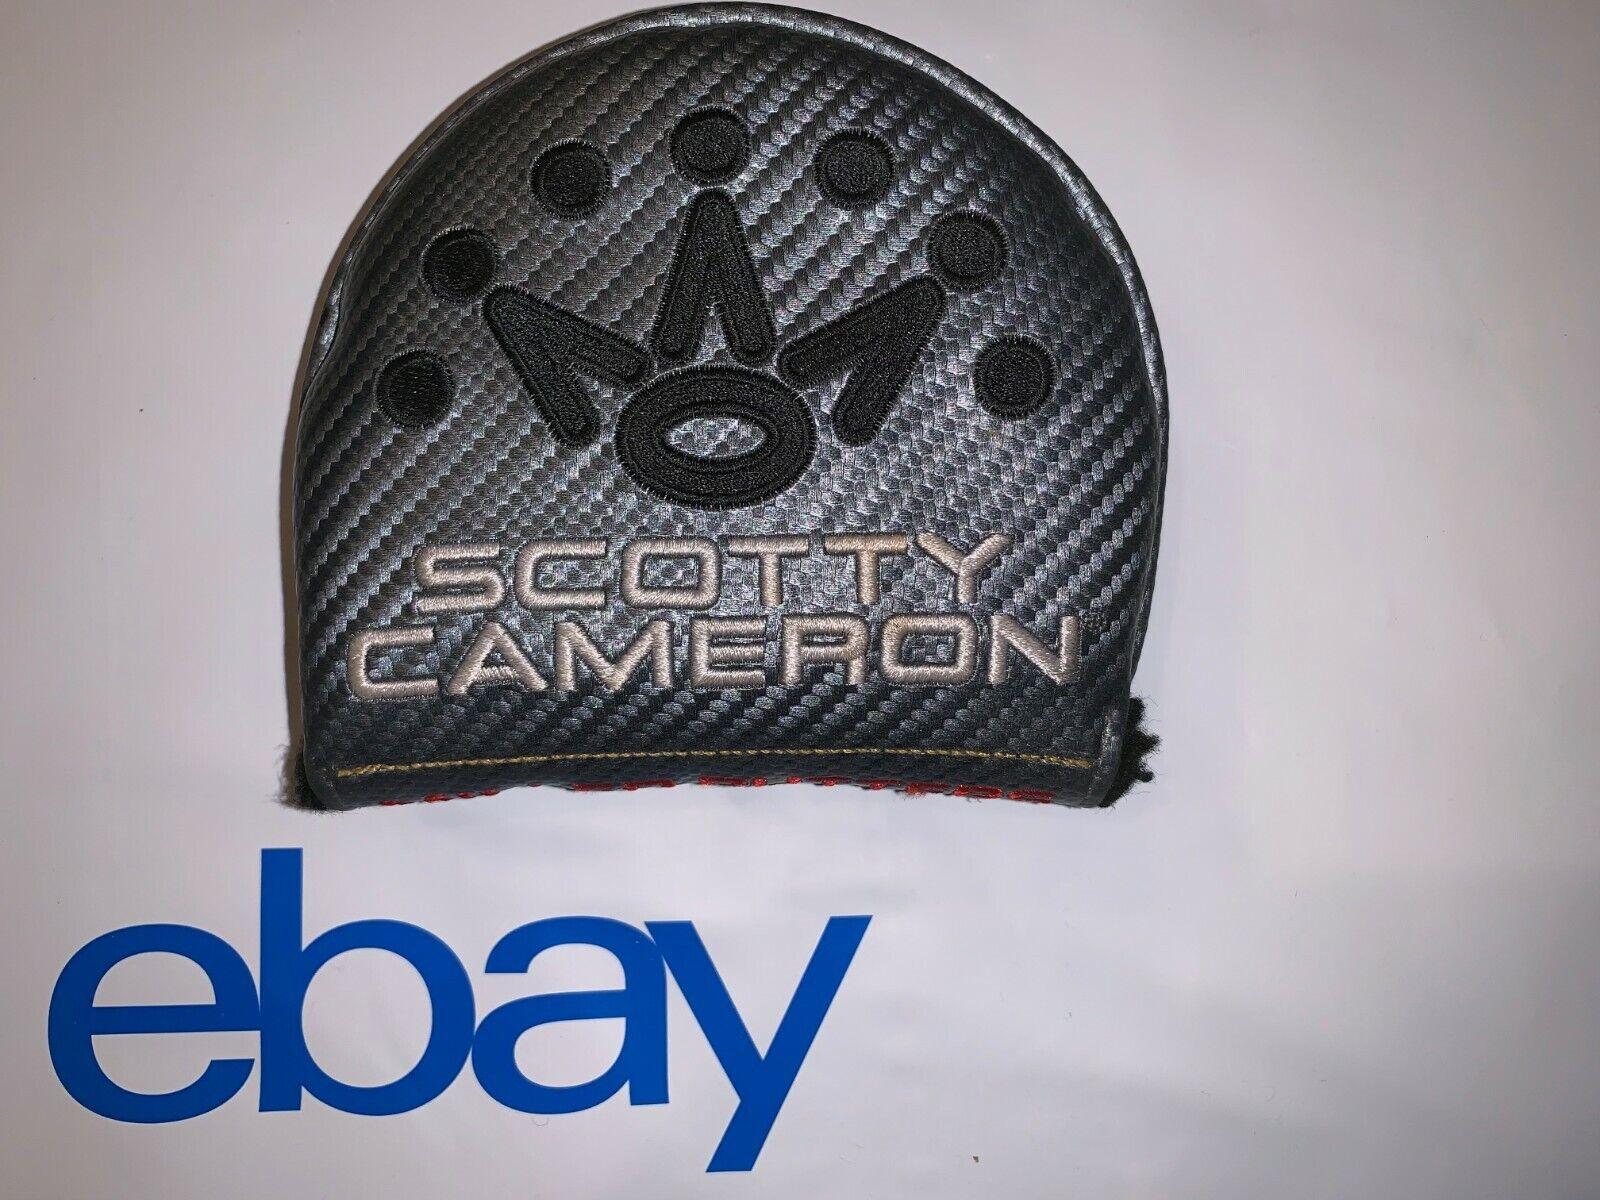 Excelente Titleist Scotty Cameron 2017 futura 5W 5.5M 7M Mid-rojoondo Headcover RH